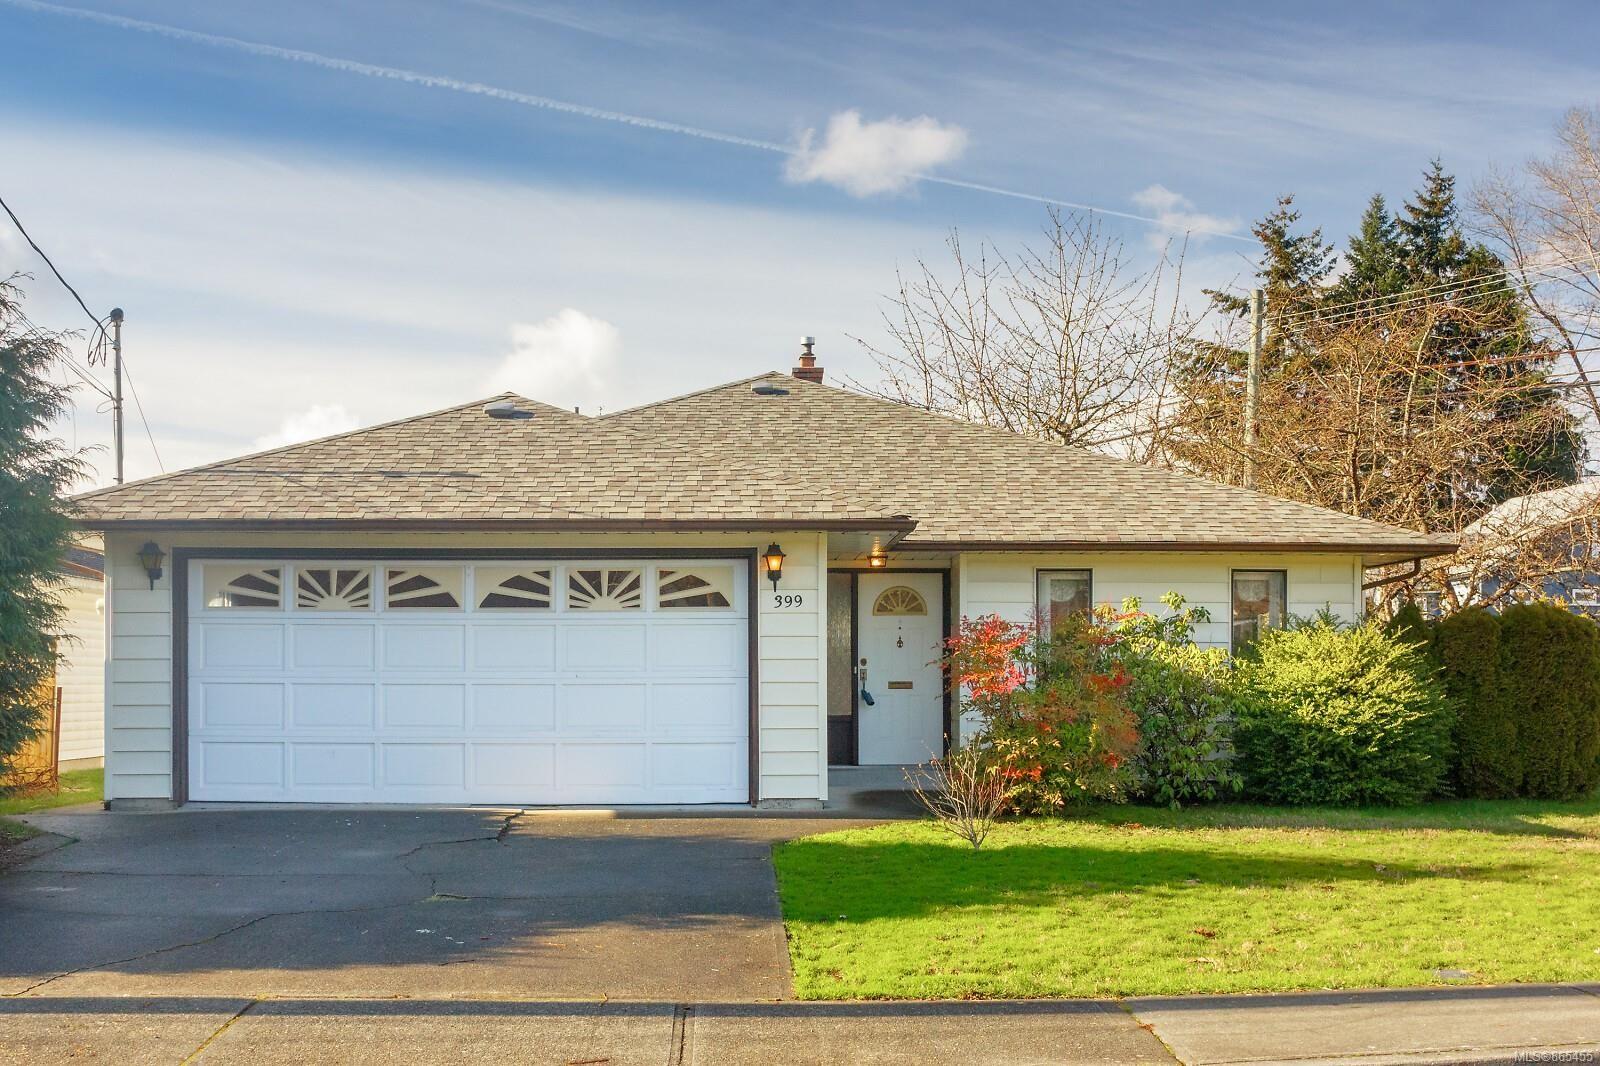 Photo 2: Photos: 399 Beech Ave in : Du East Duncan House for sale (Duncan)  : MLS®# 865455